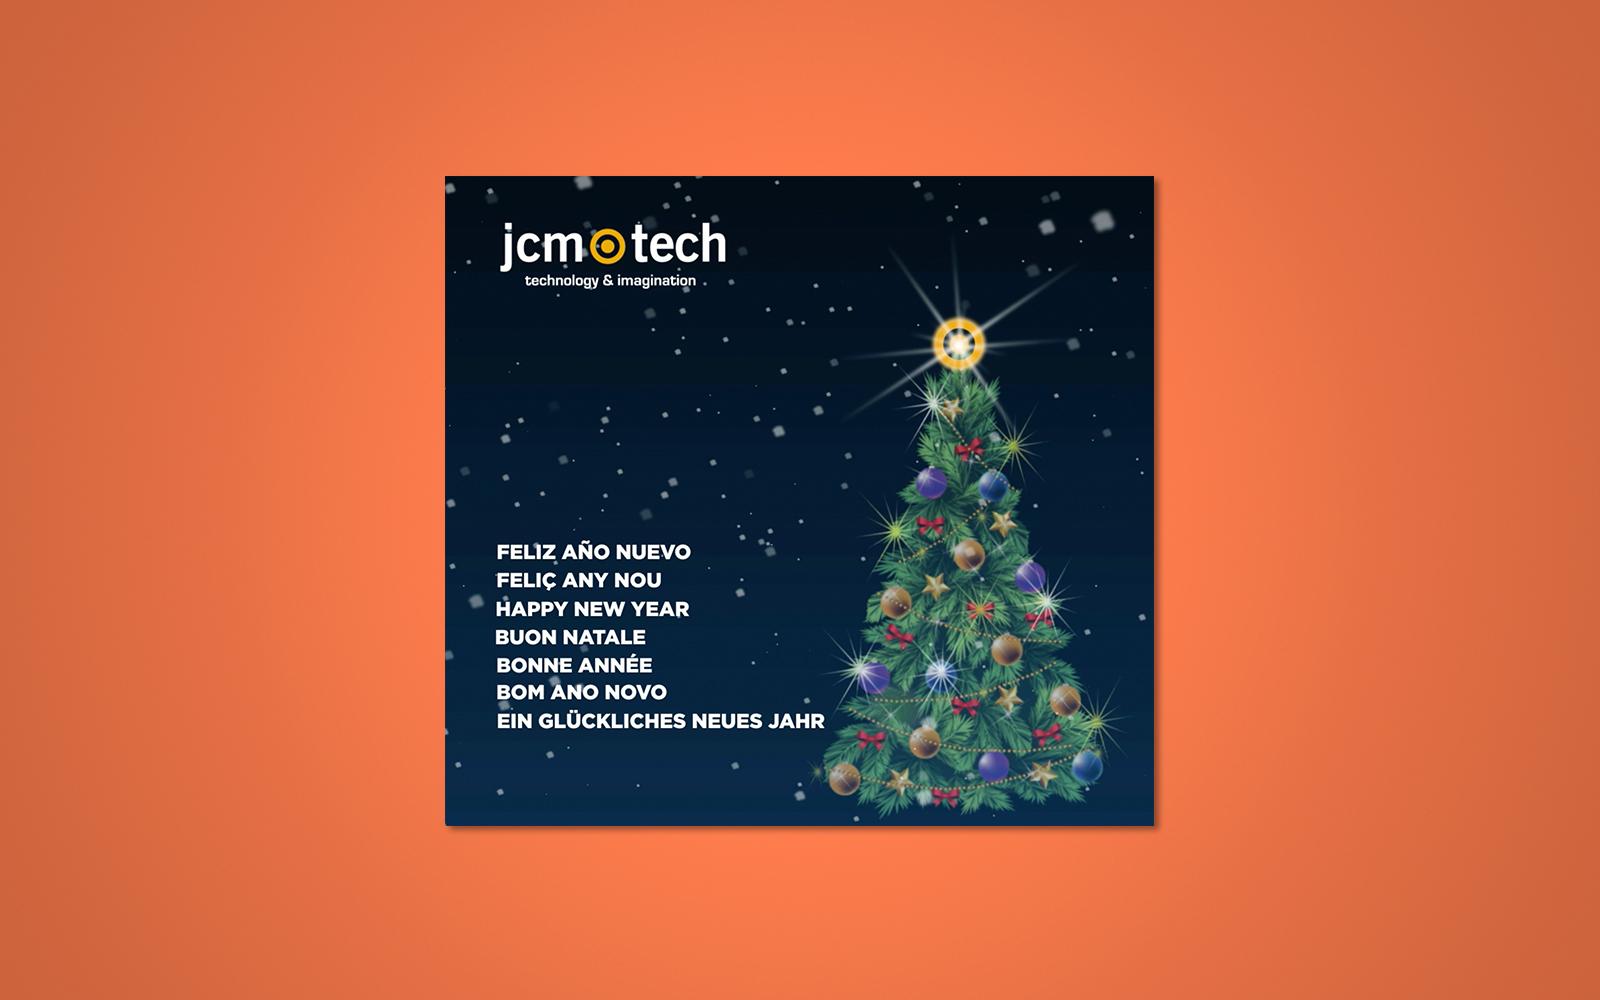 Felicitación De Navidad JCM Technologies